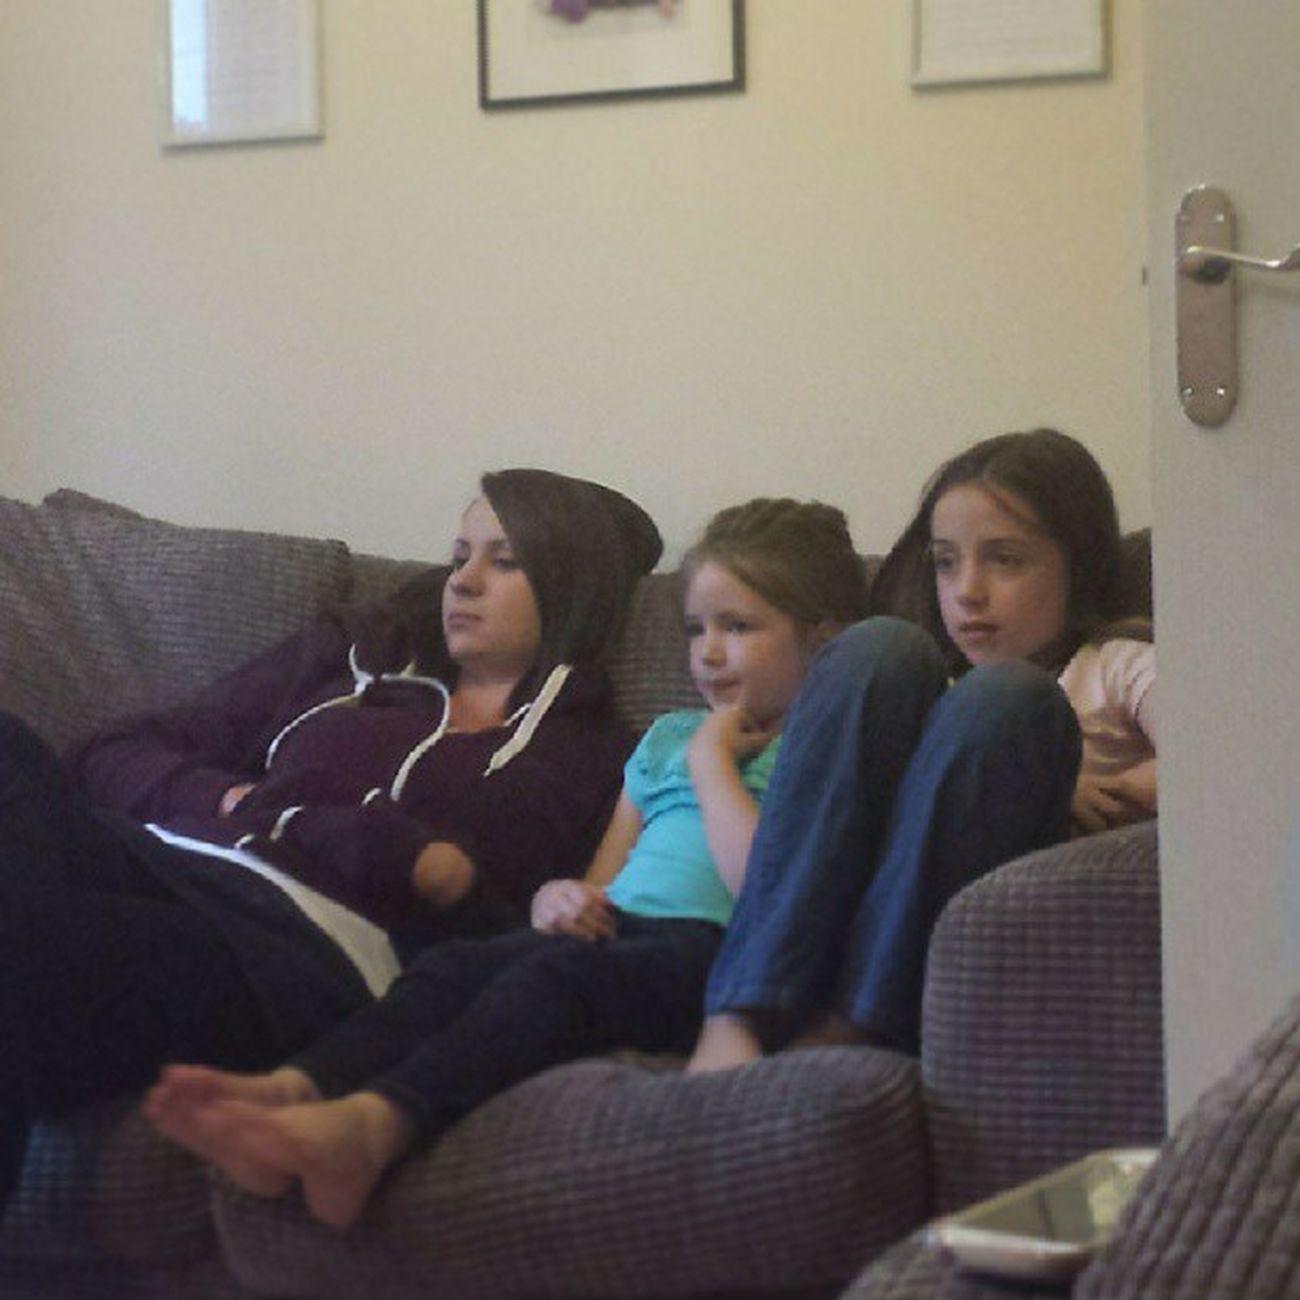 Sofabuddies watching Matilda